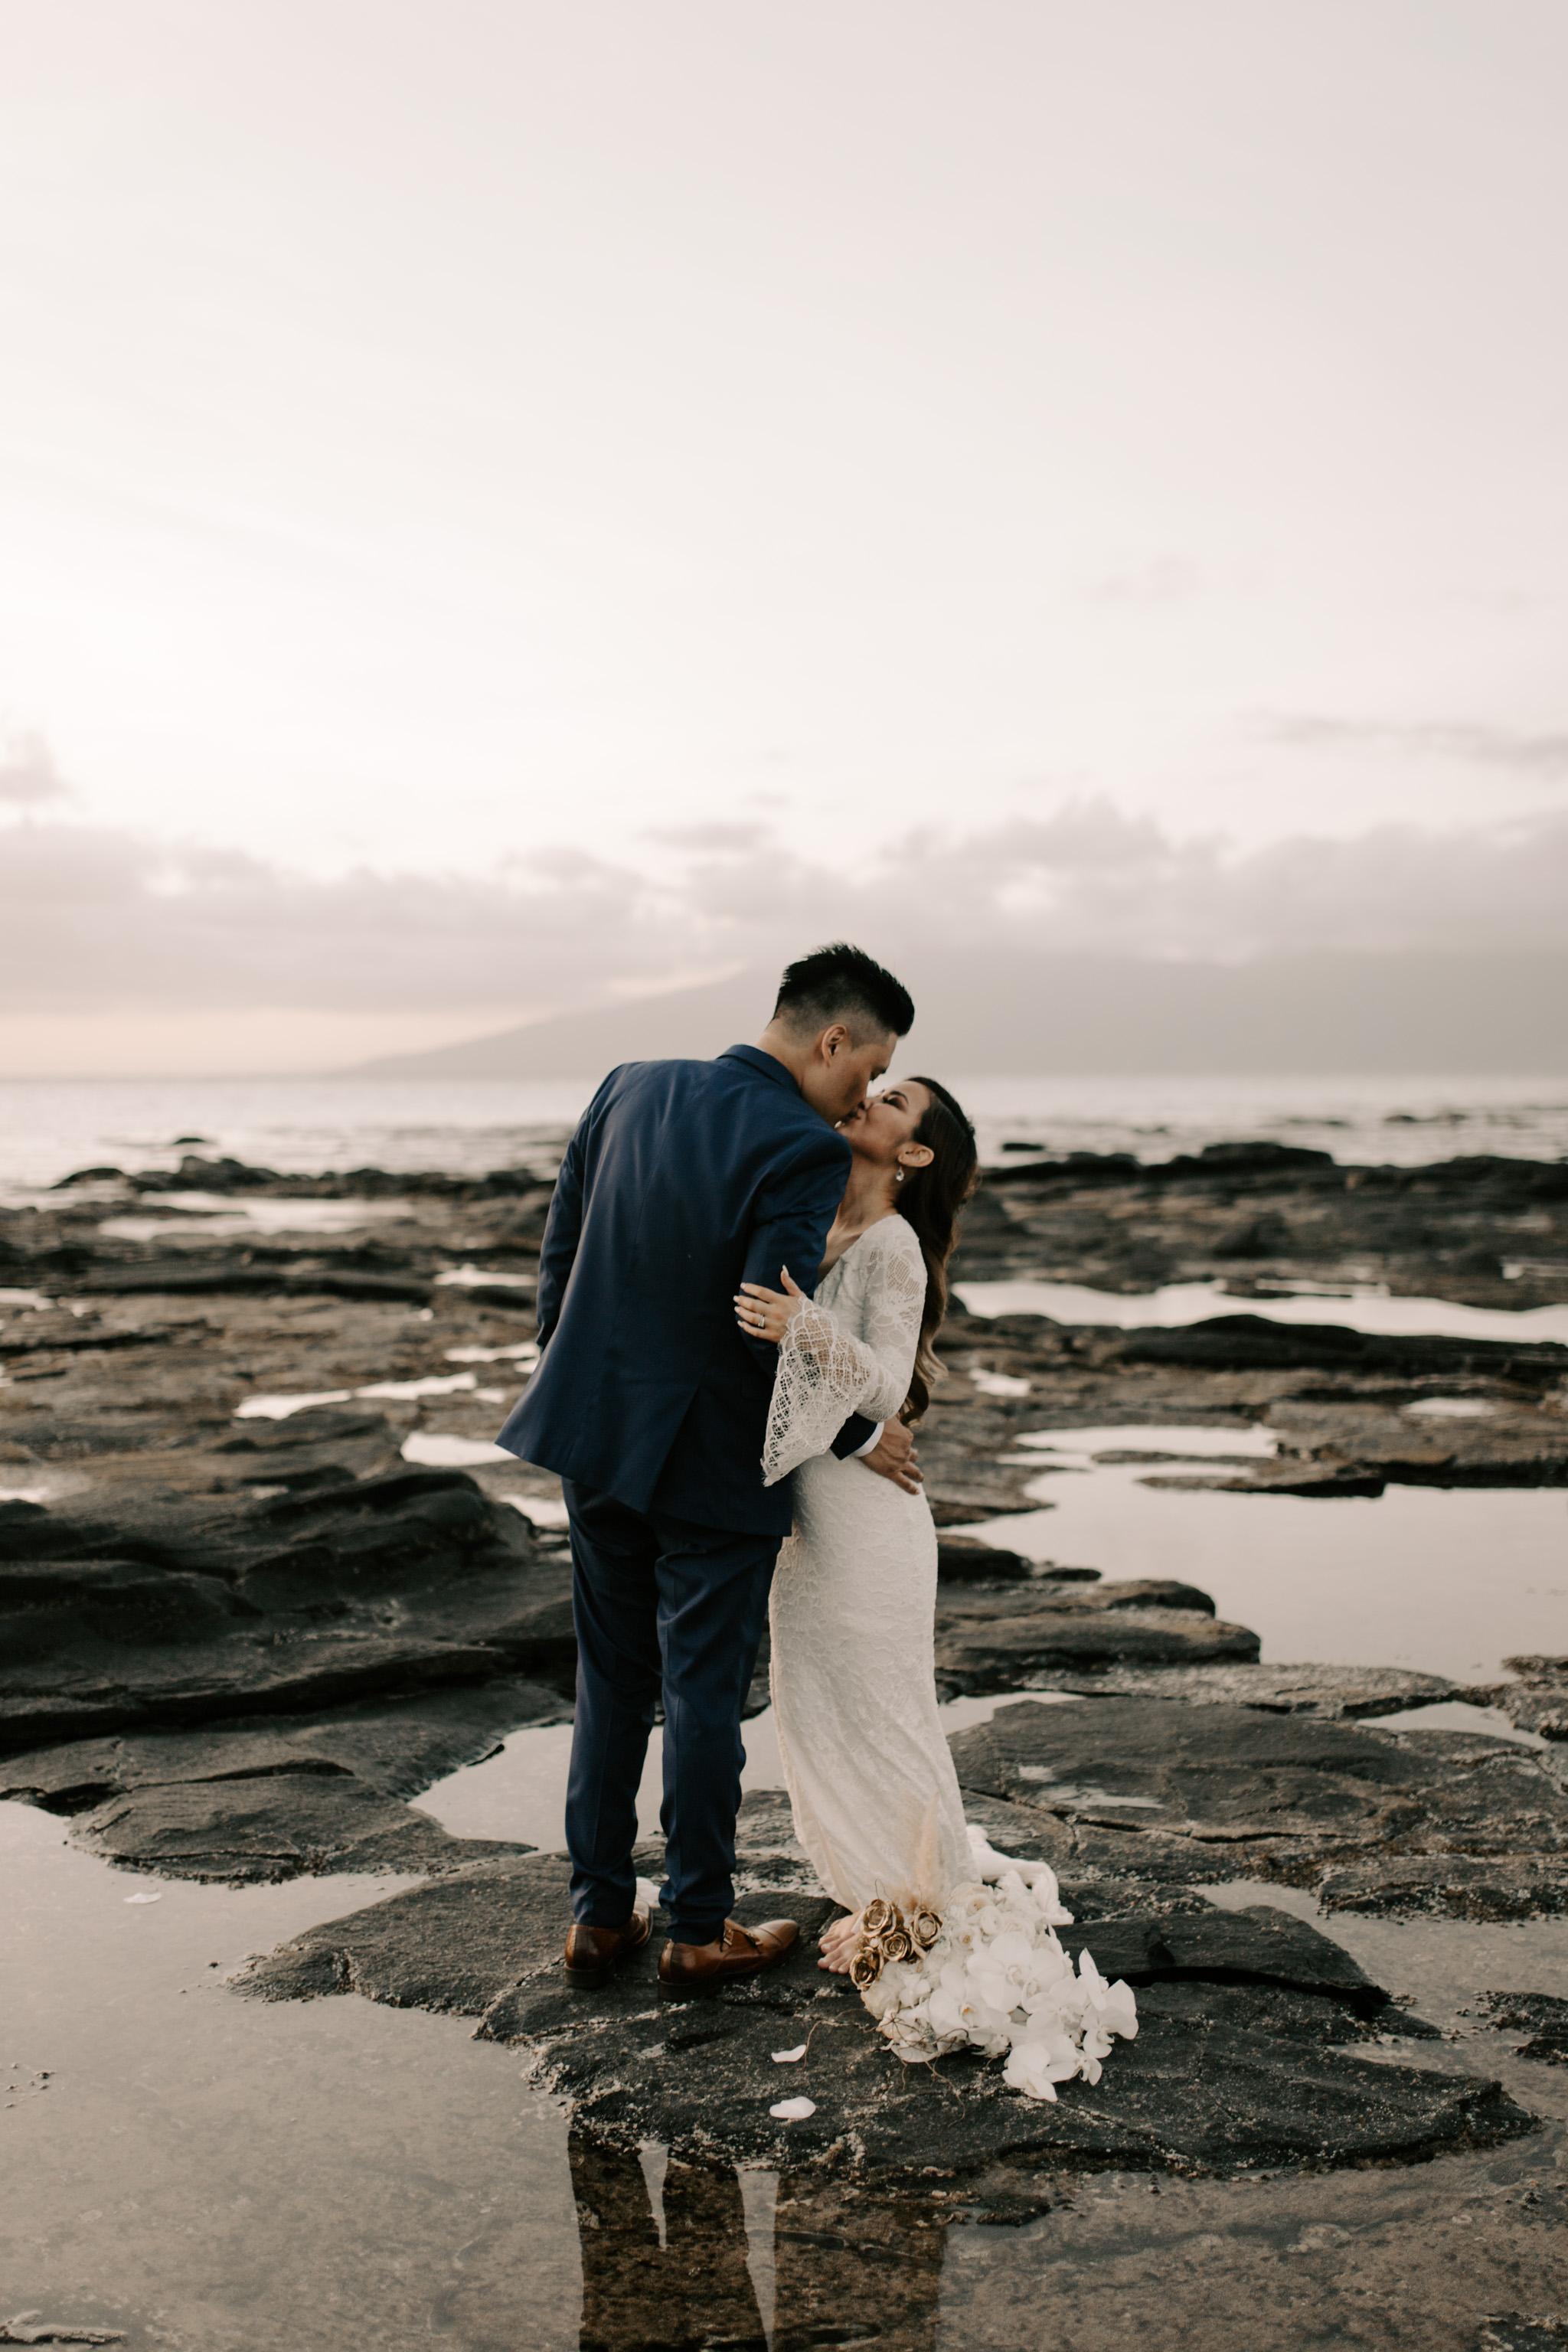 Gorgeous sunset wedding photos in the Grace Loves Lace Piper wedding dress   Merriman's Kapalua Maui wedding by Hawaii wedding photographer Desiree Leilani